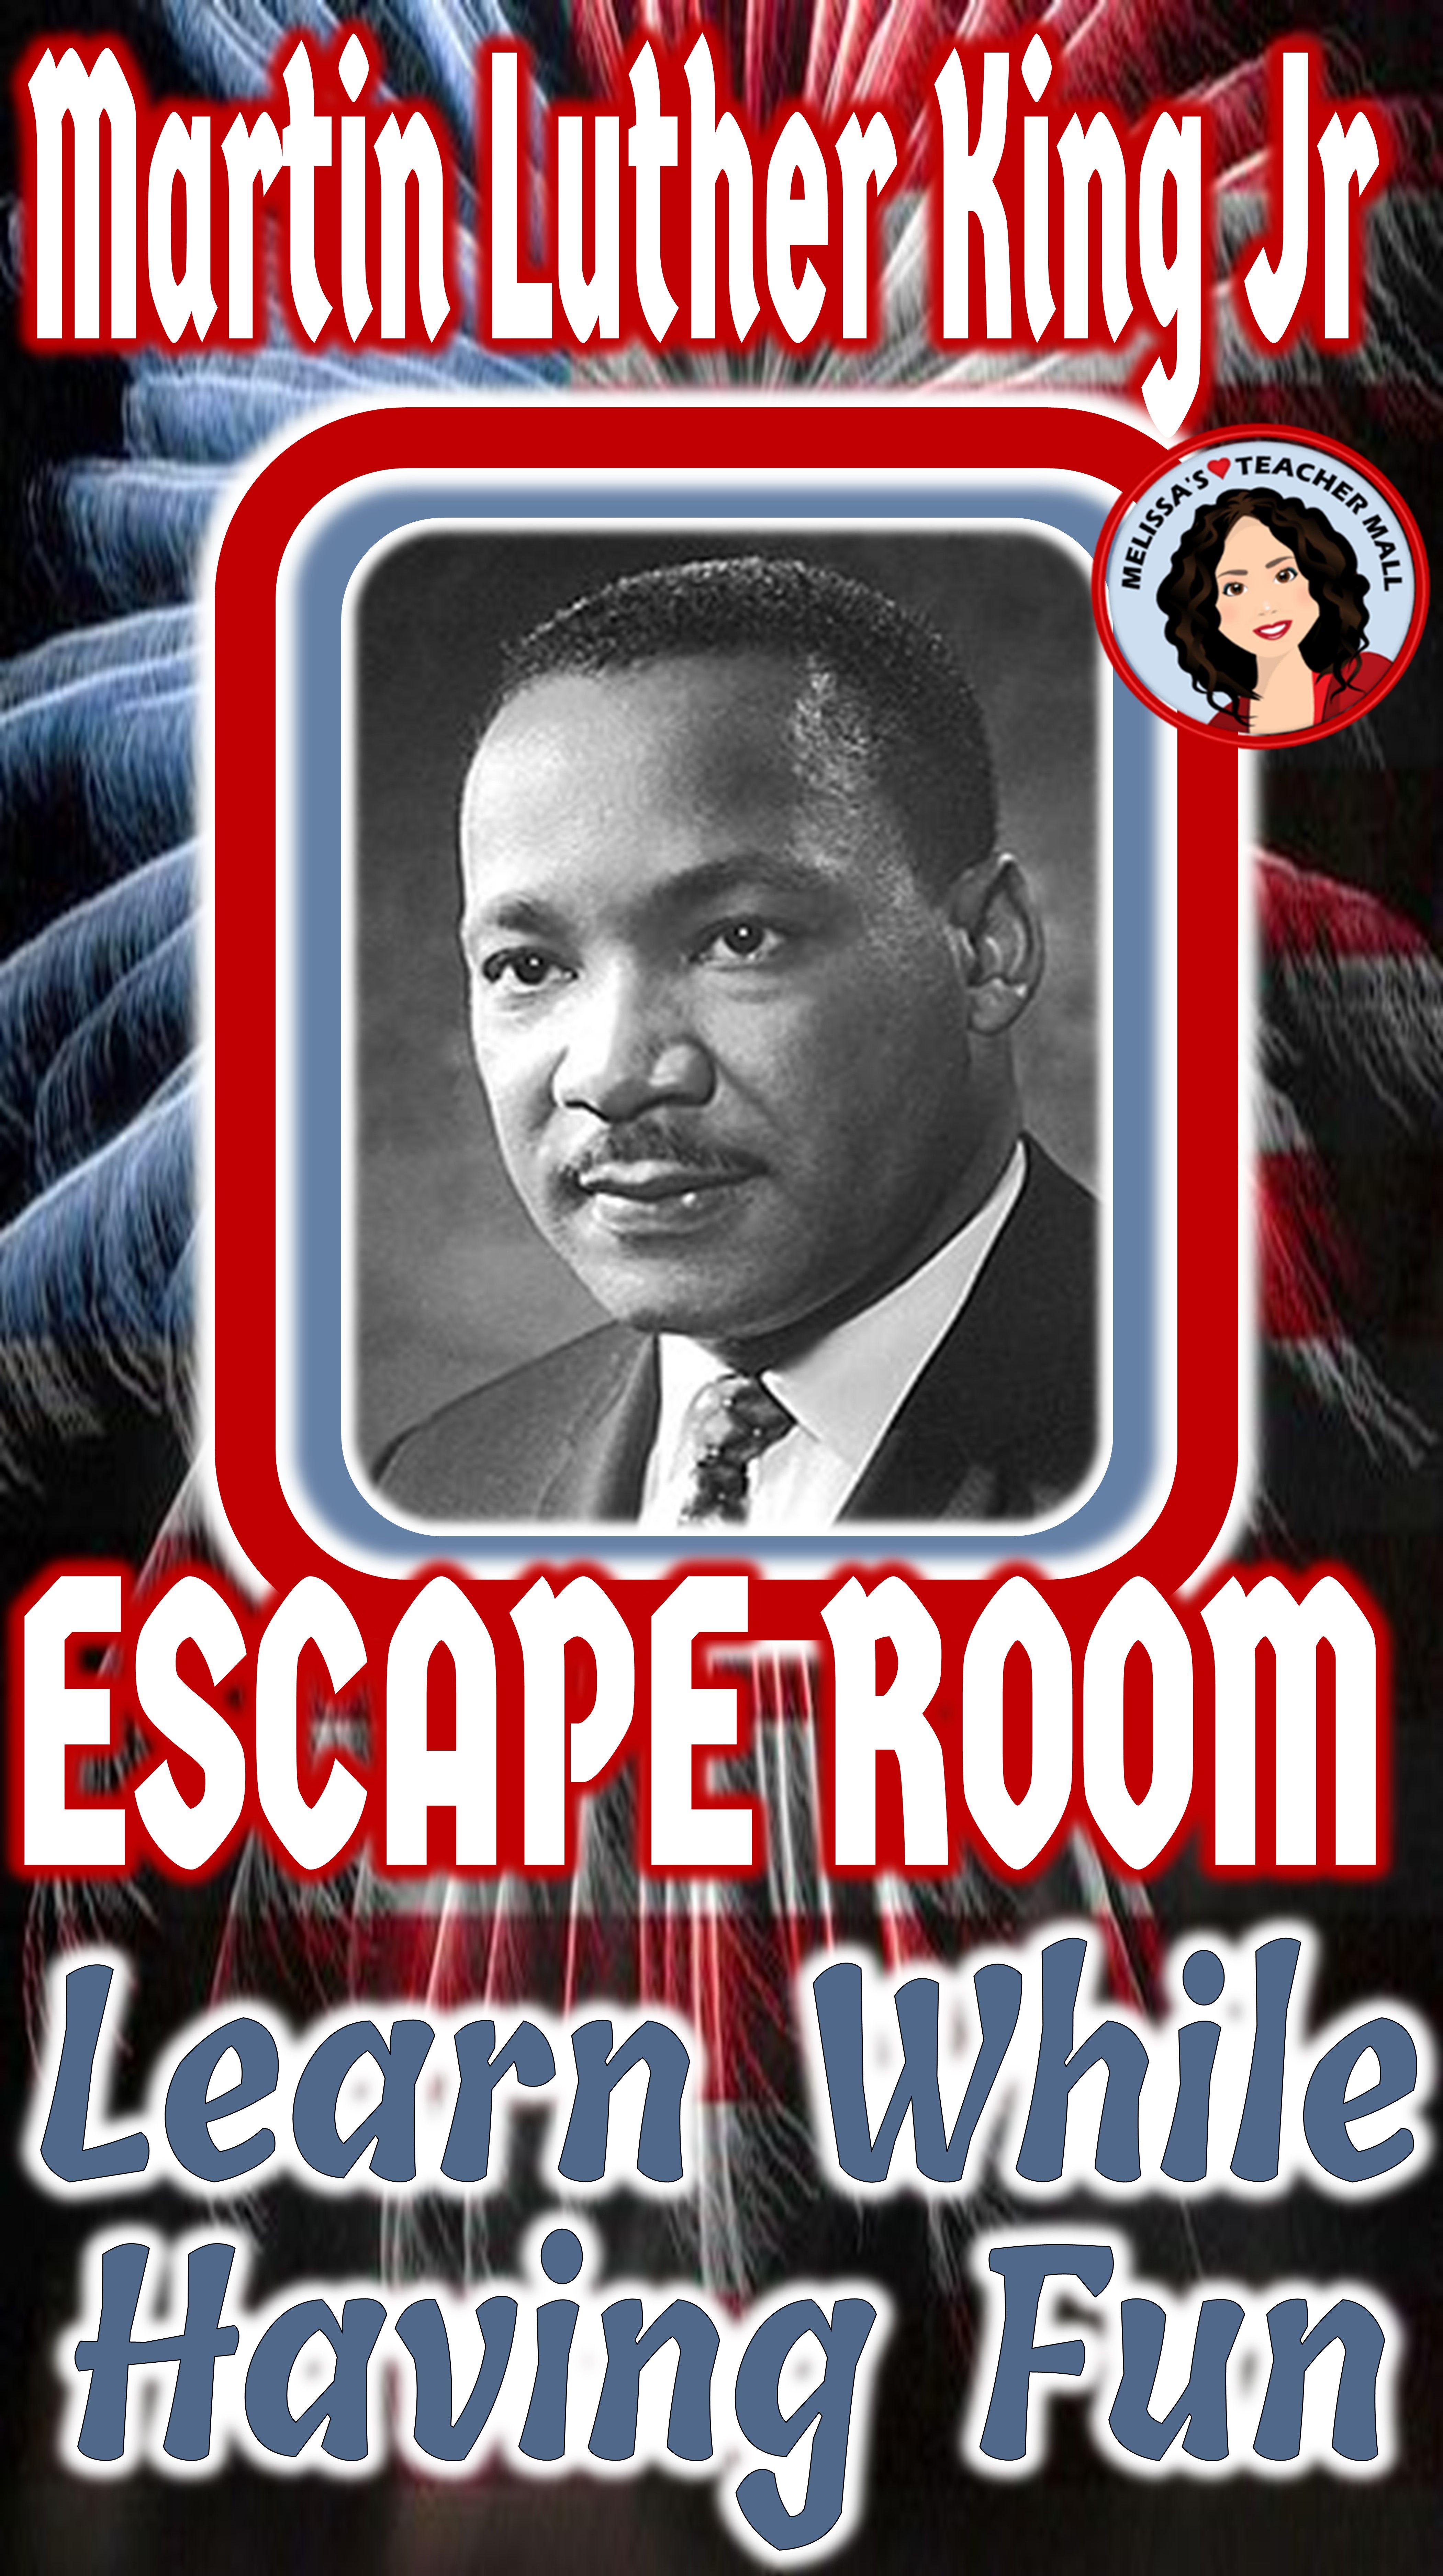 Black History Month Escape Room Martin Luther King Jr